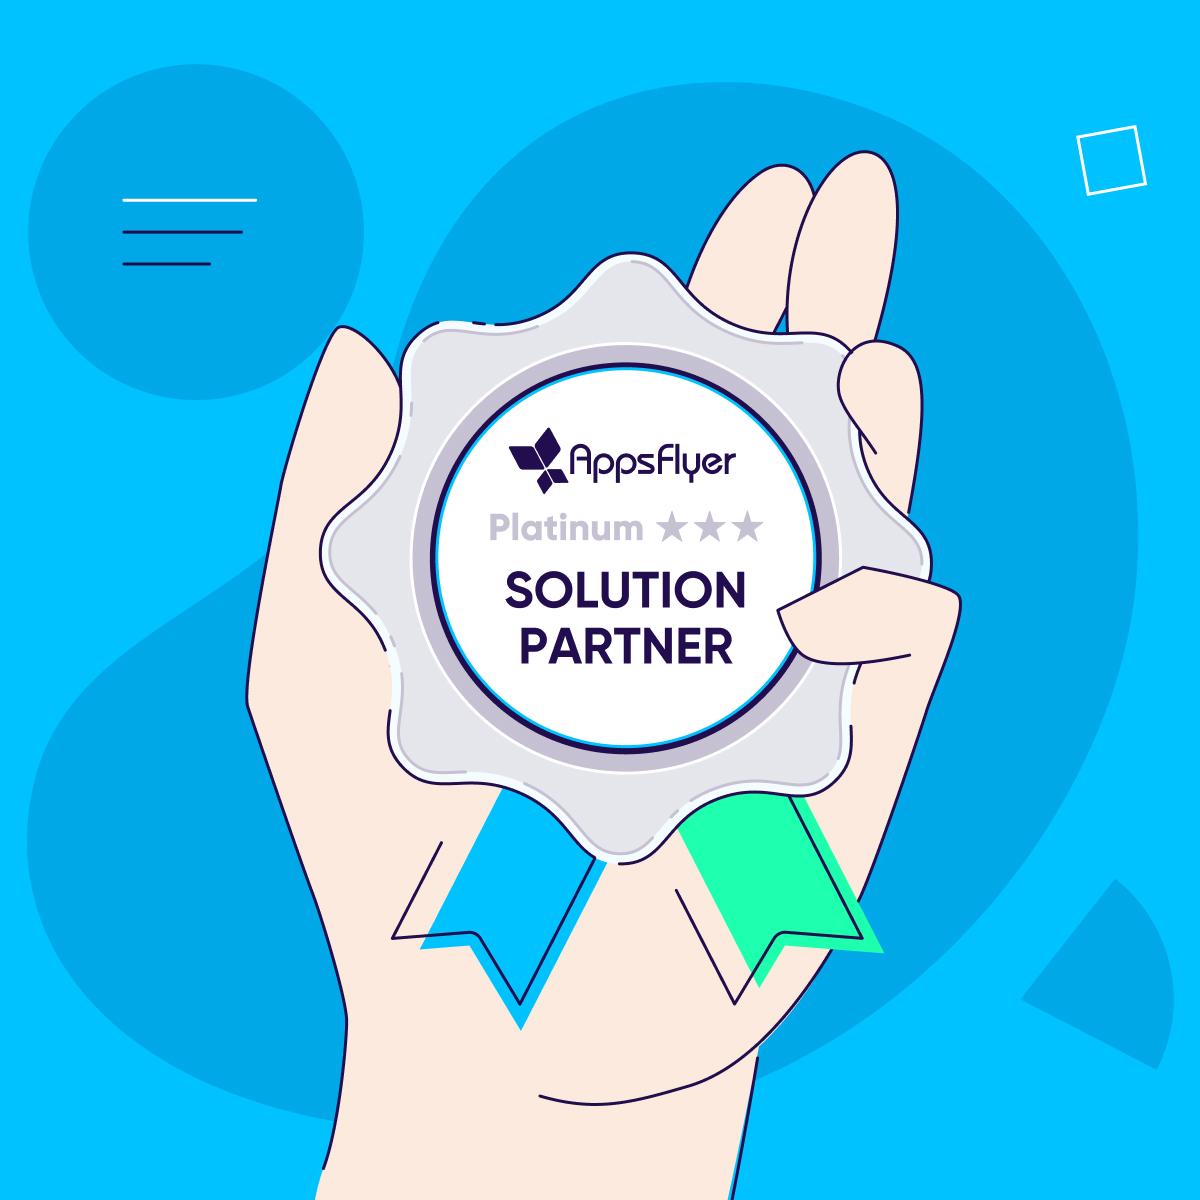 solution partner program for agencies